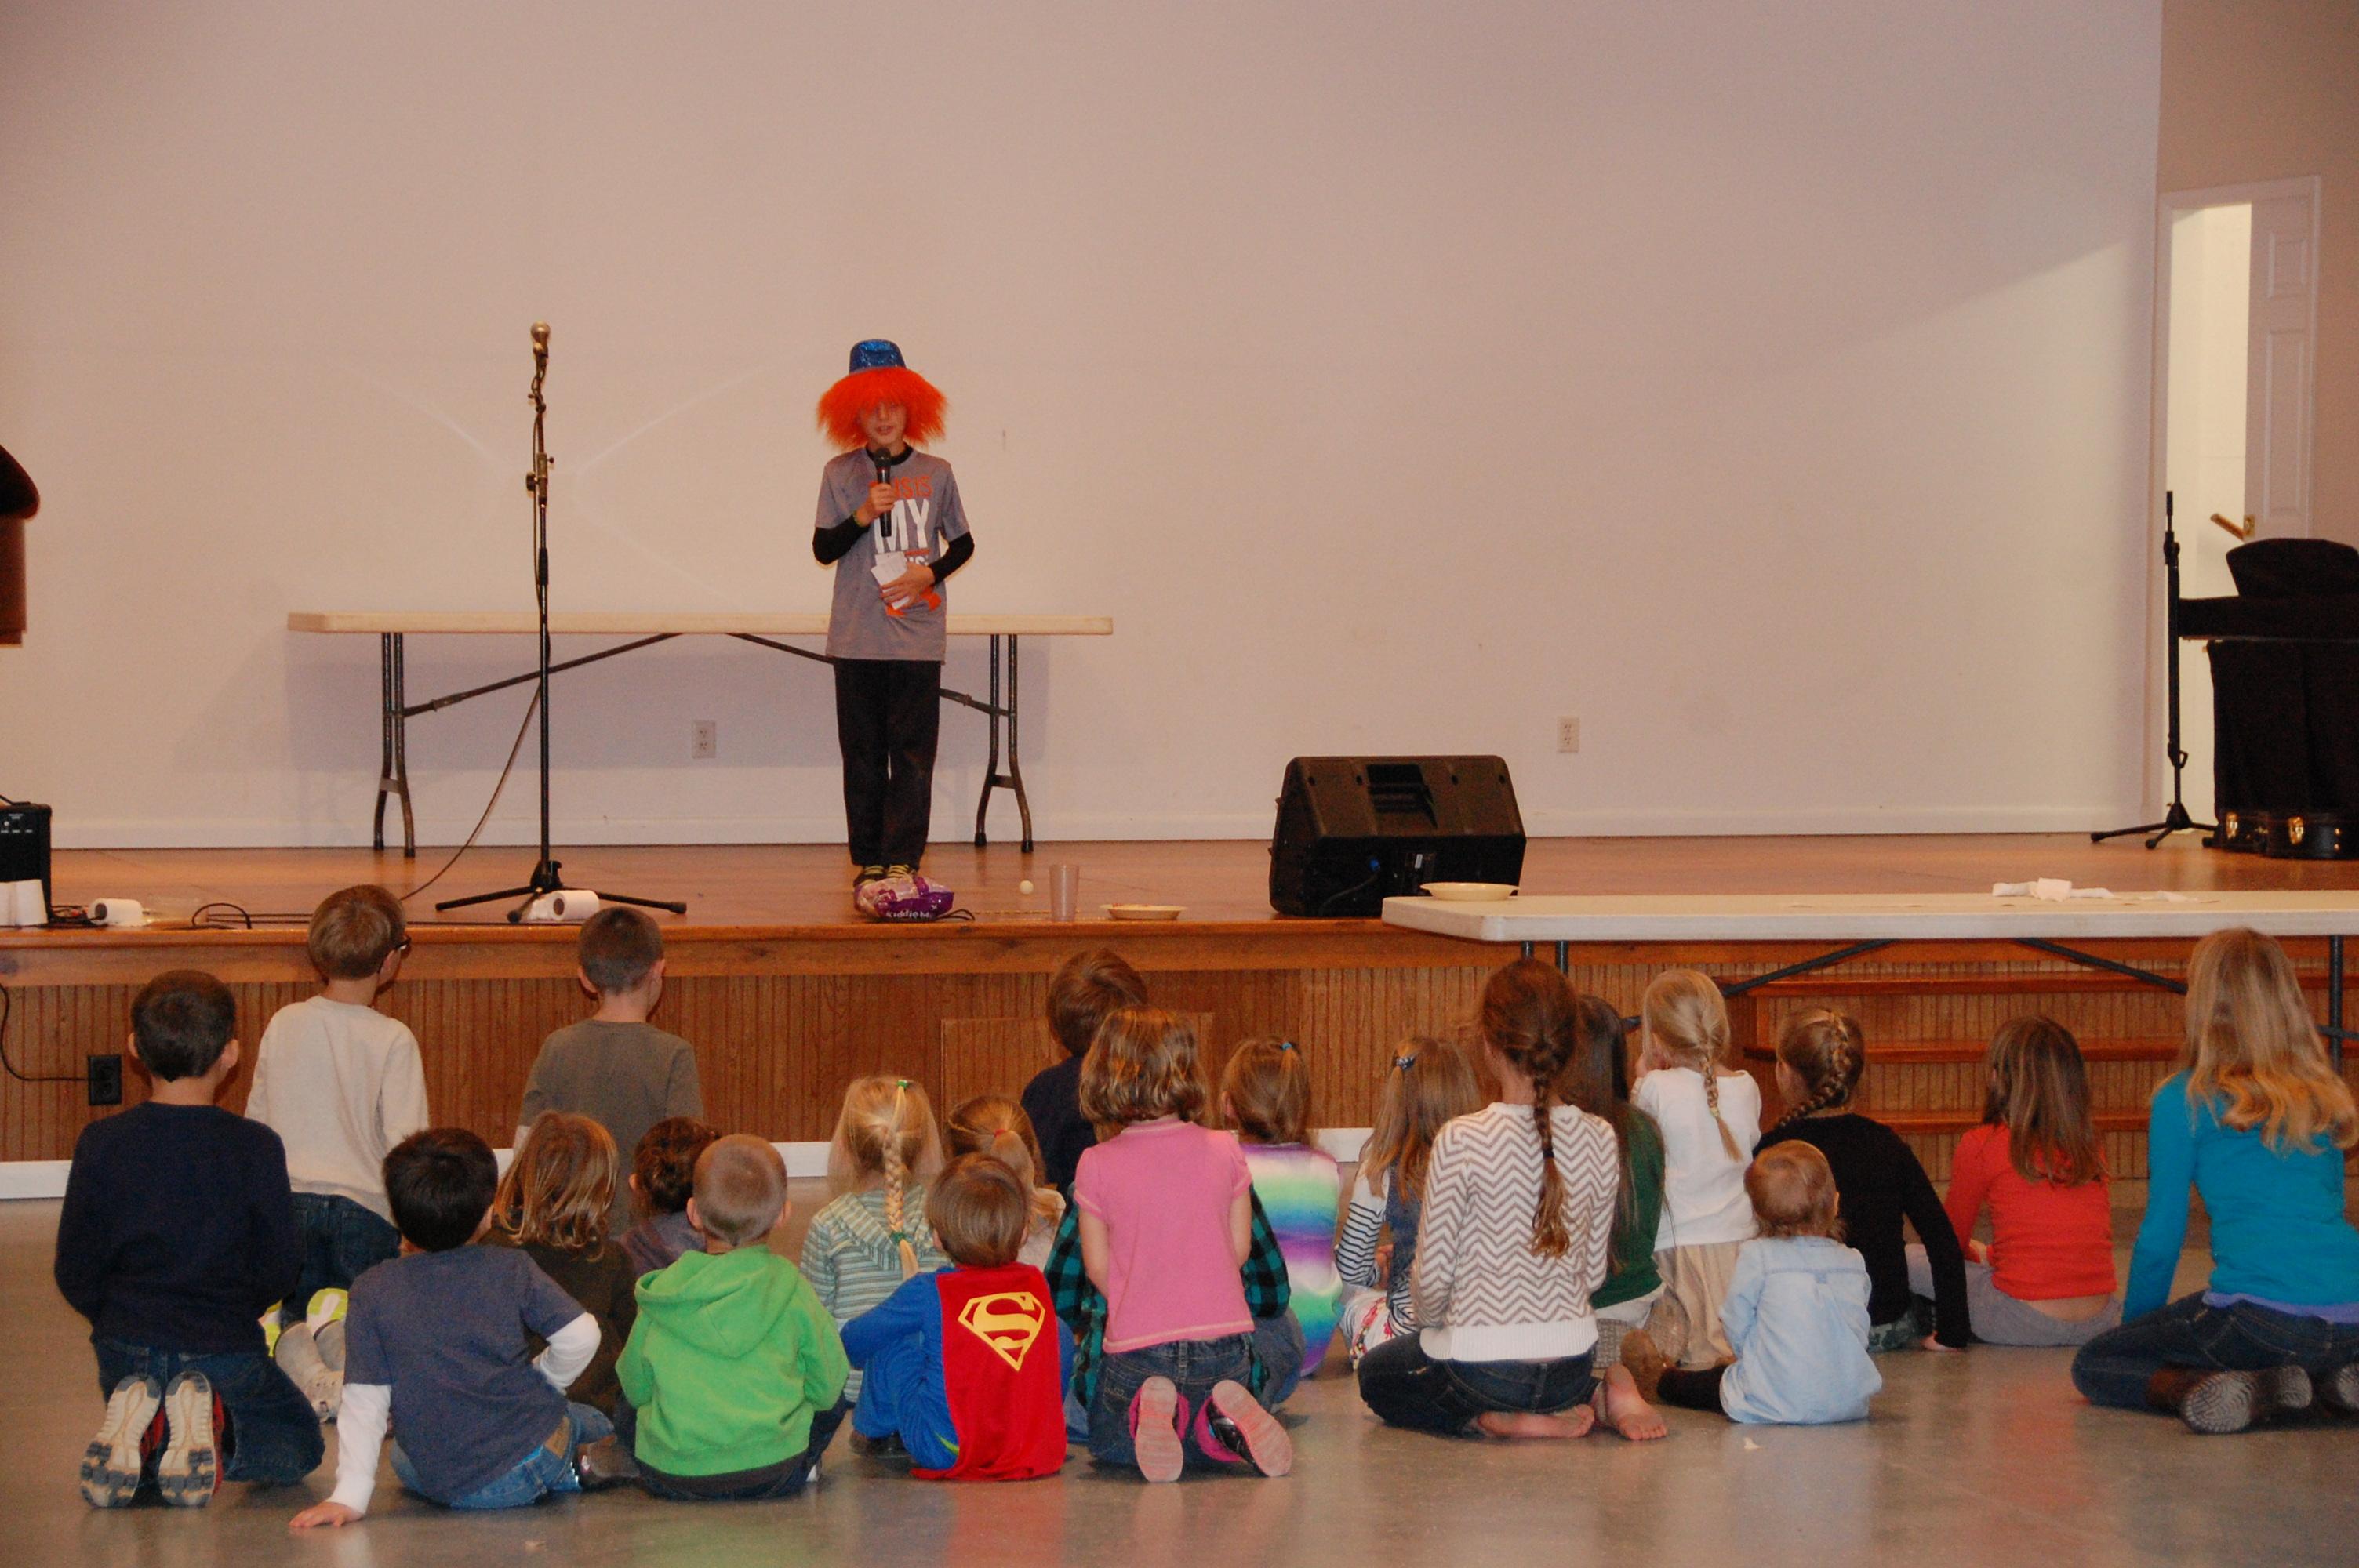 Brooks Cox telling jokes to the kids.